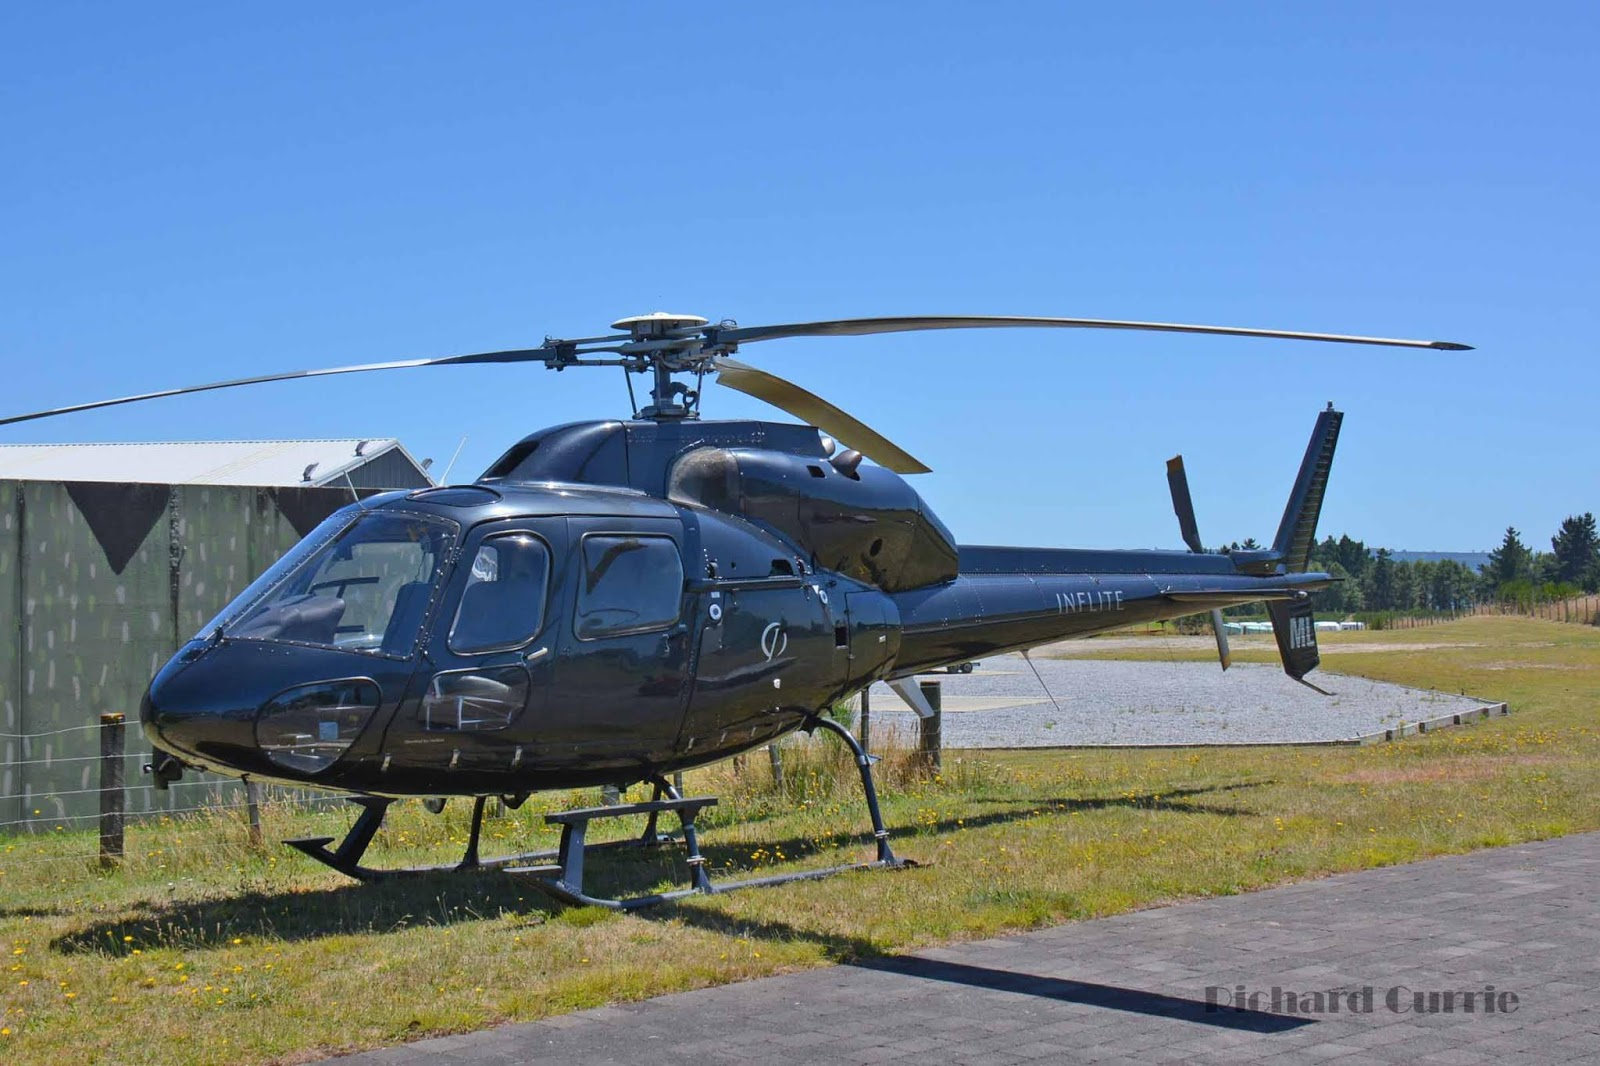 NZ Civil Aircraft: Sea Rey ZK-REY